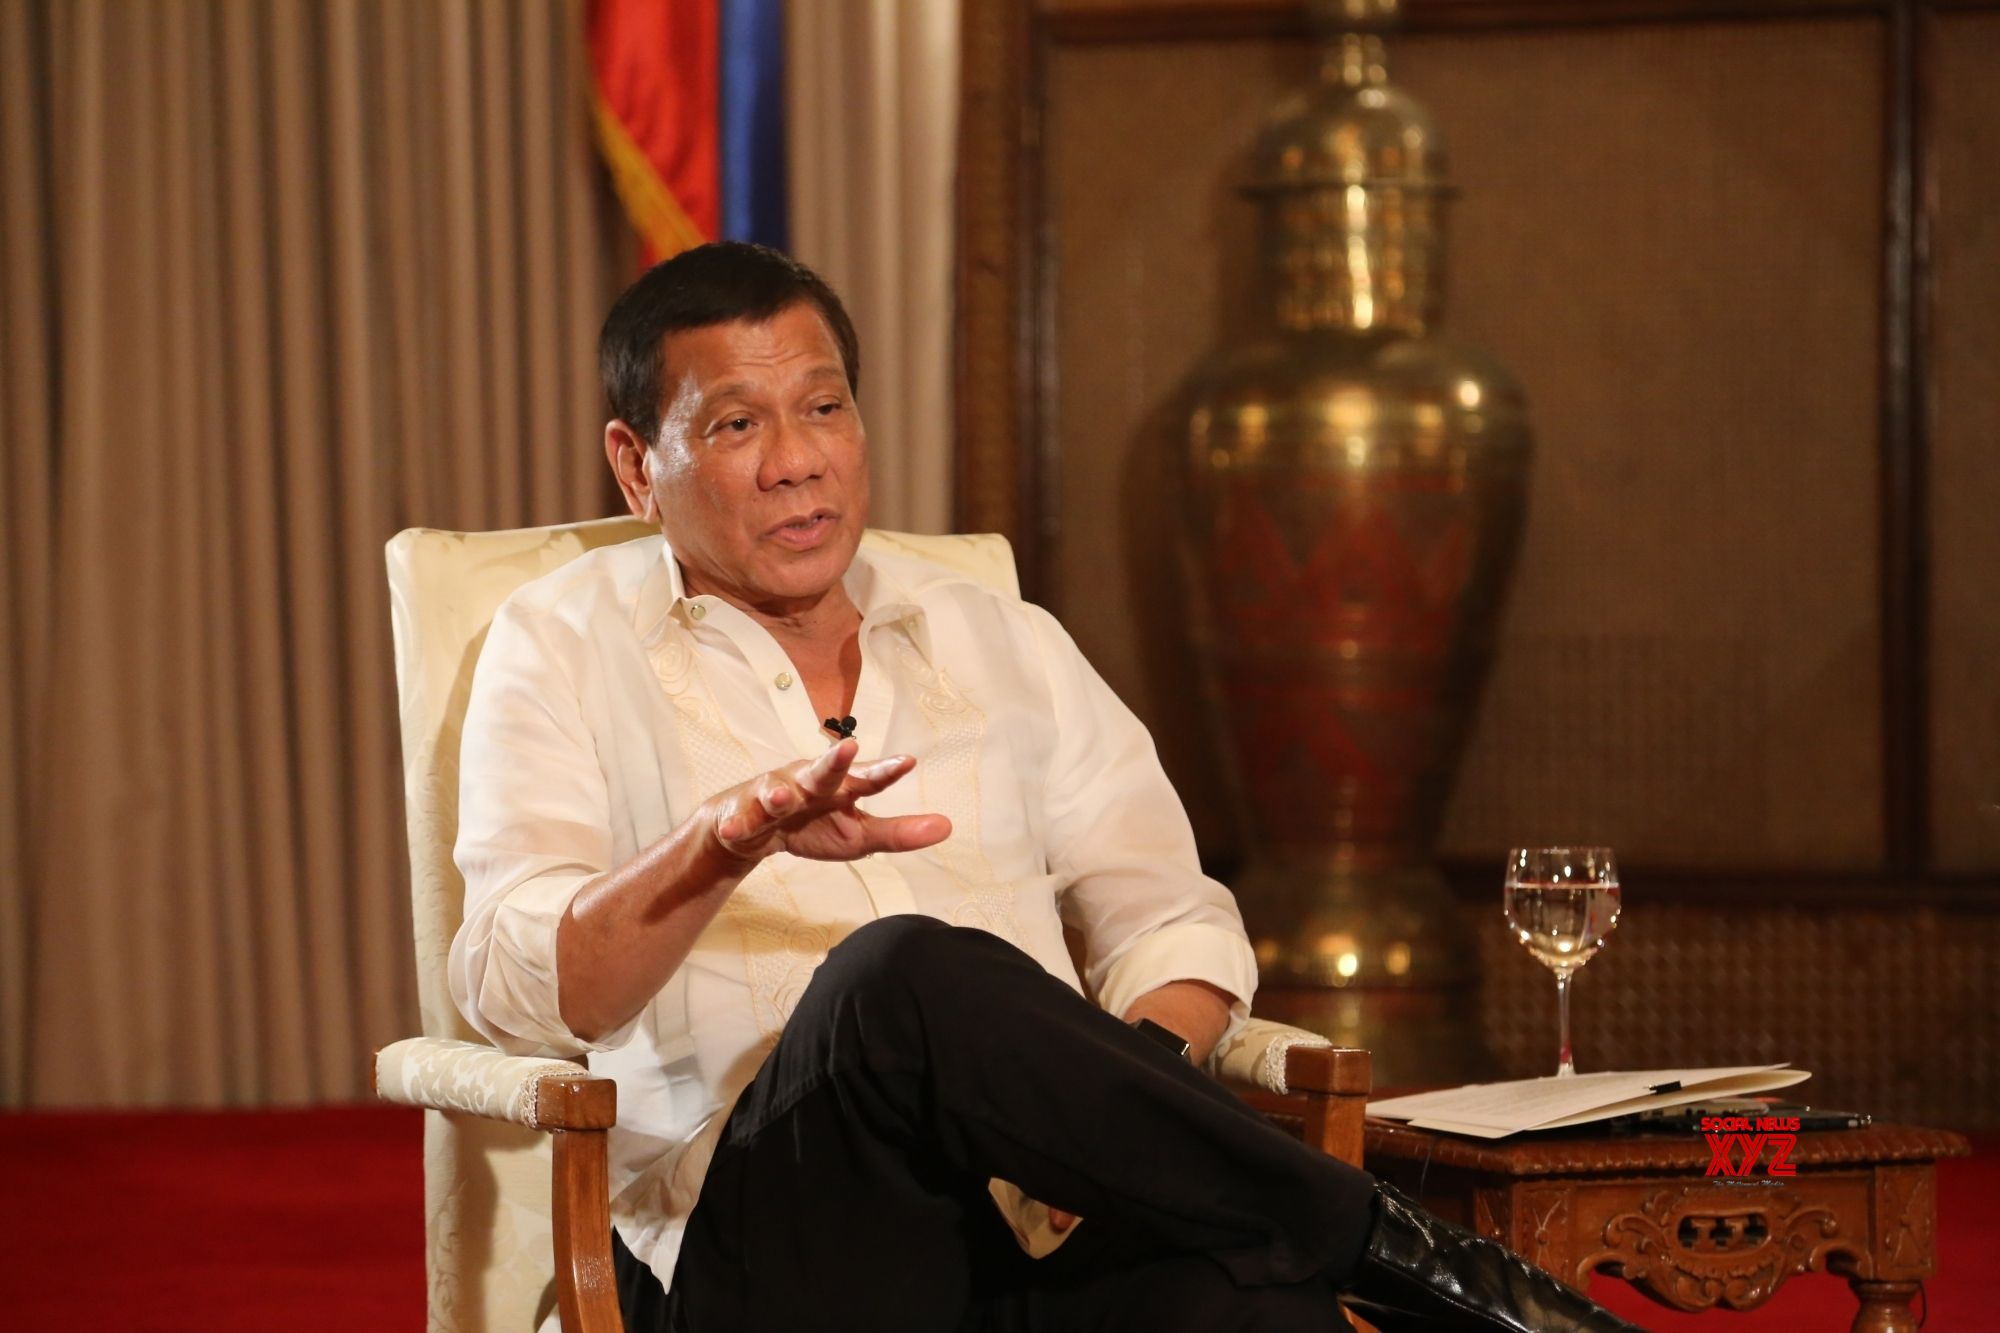 Useless, critical Catholic bishops should be killed: Duterte